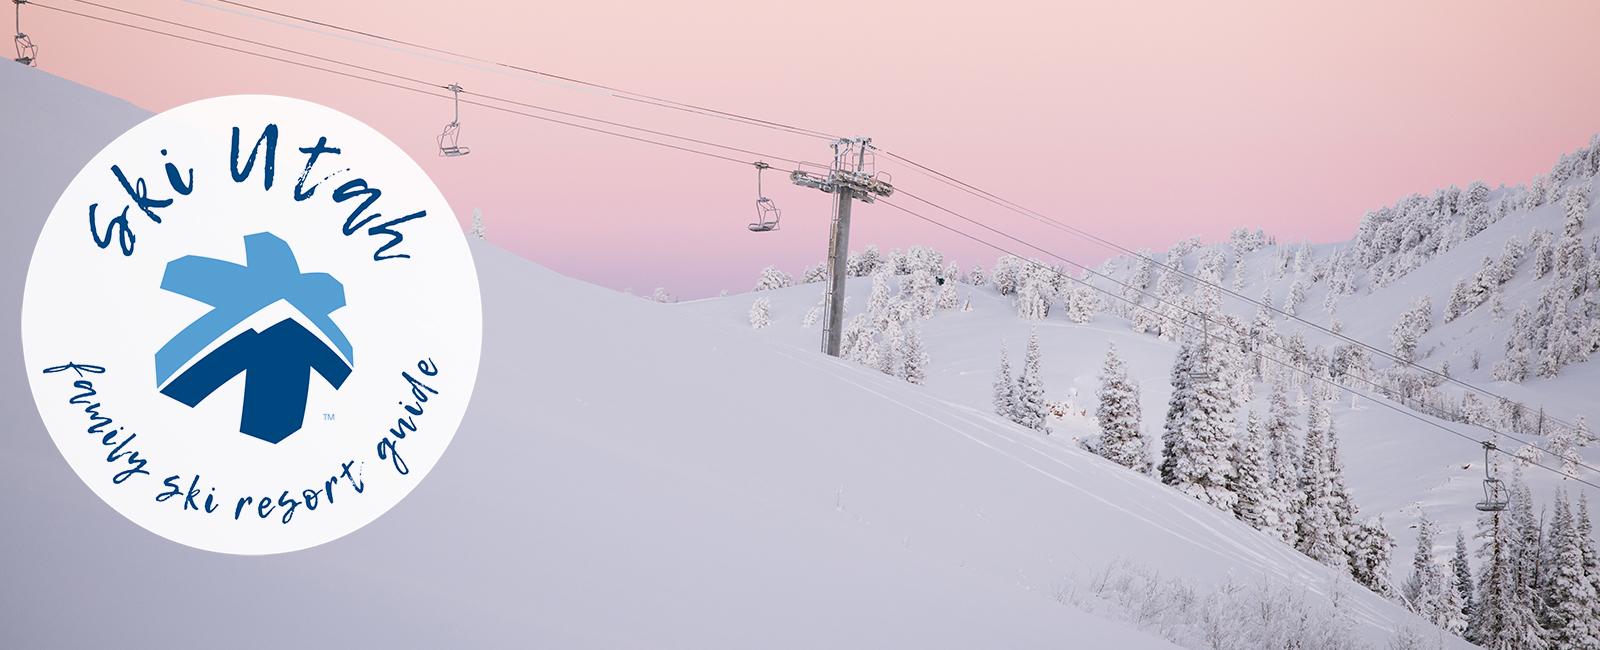 Family Ski Resort Guide | Powder Mountain